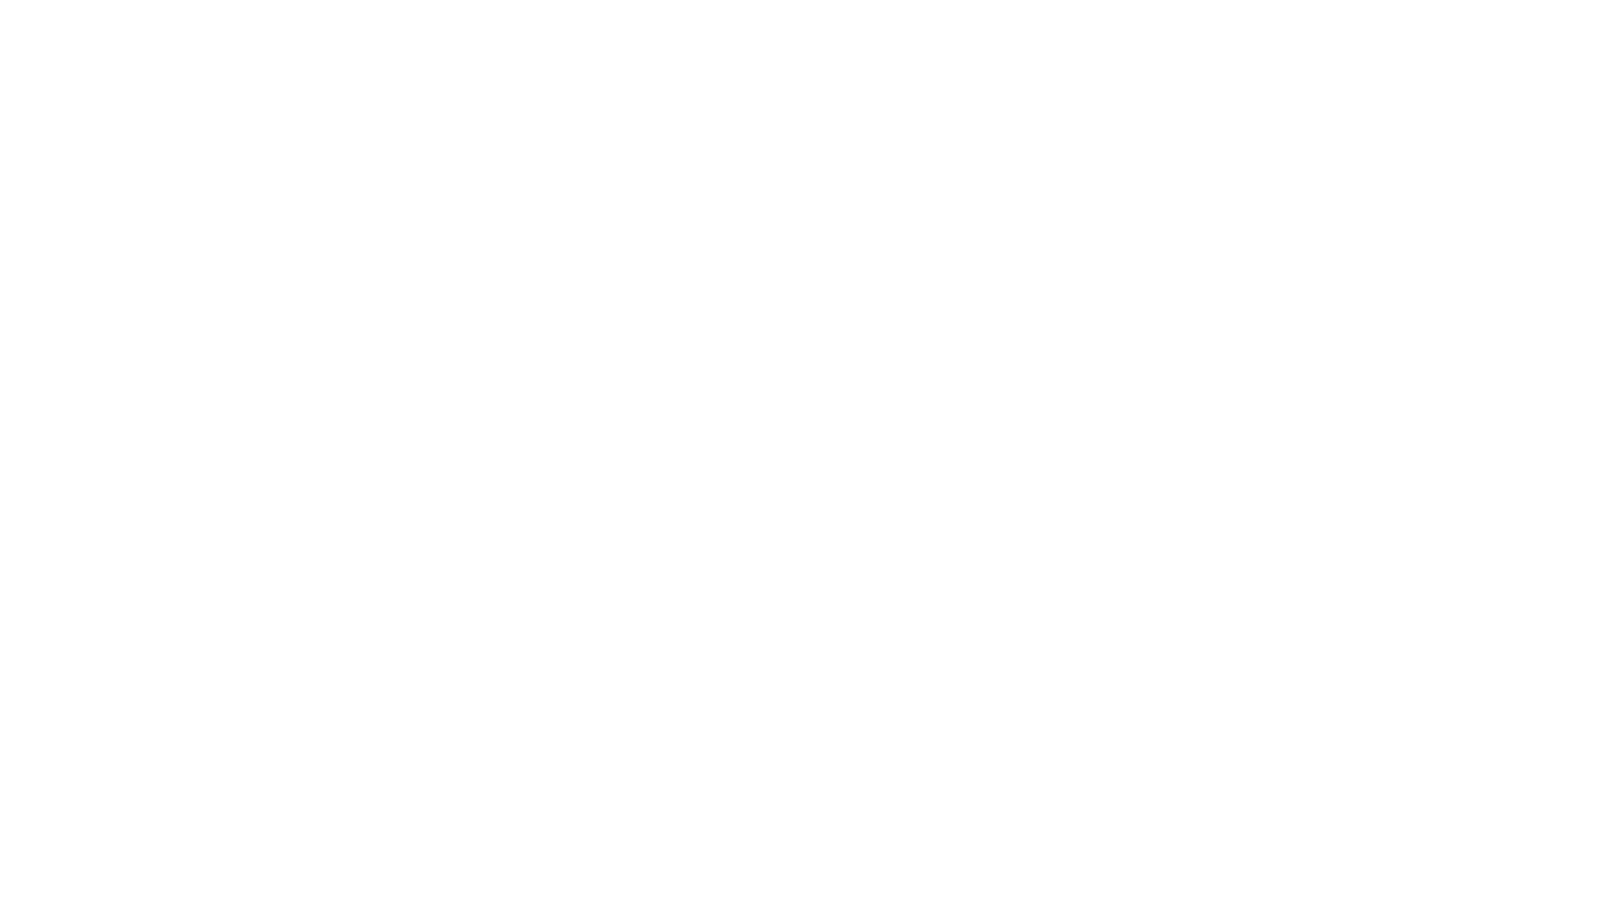 #PoldaMetroJaya #SubbidPenmas #HumasPMJ #PolriPromoter